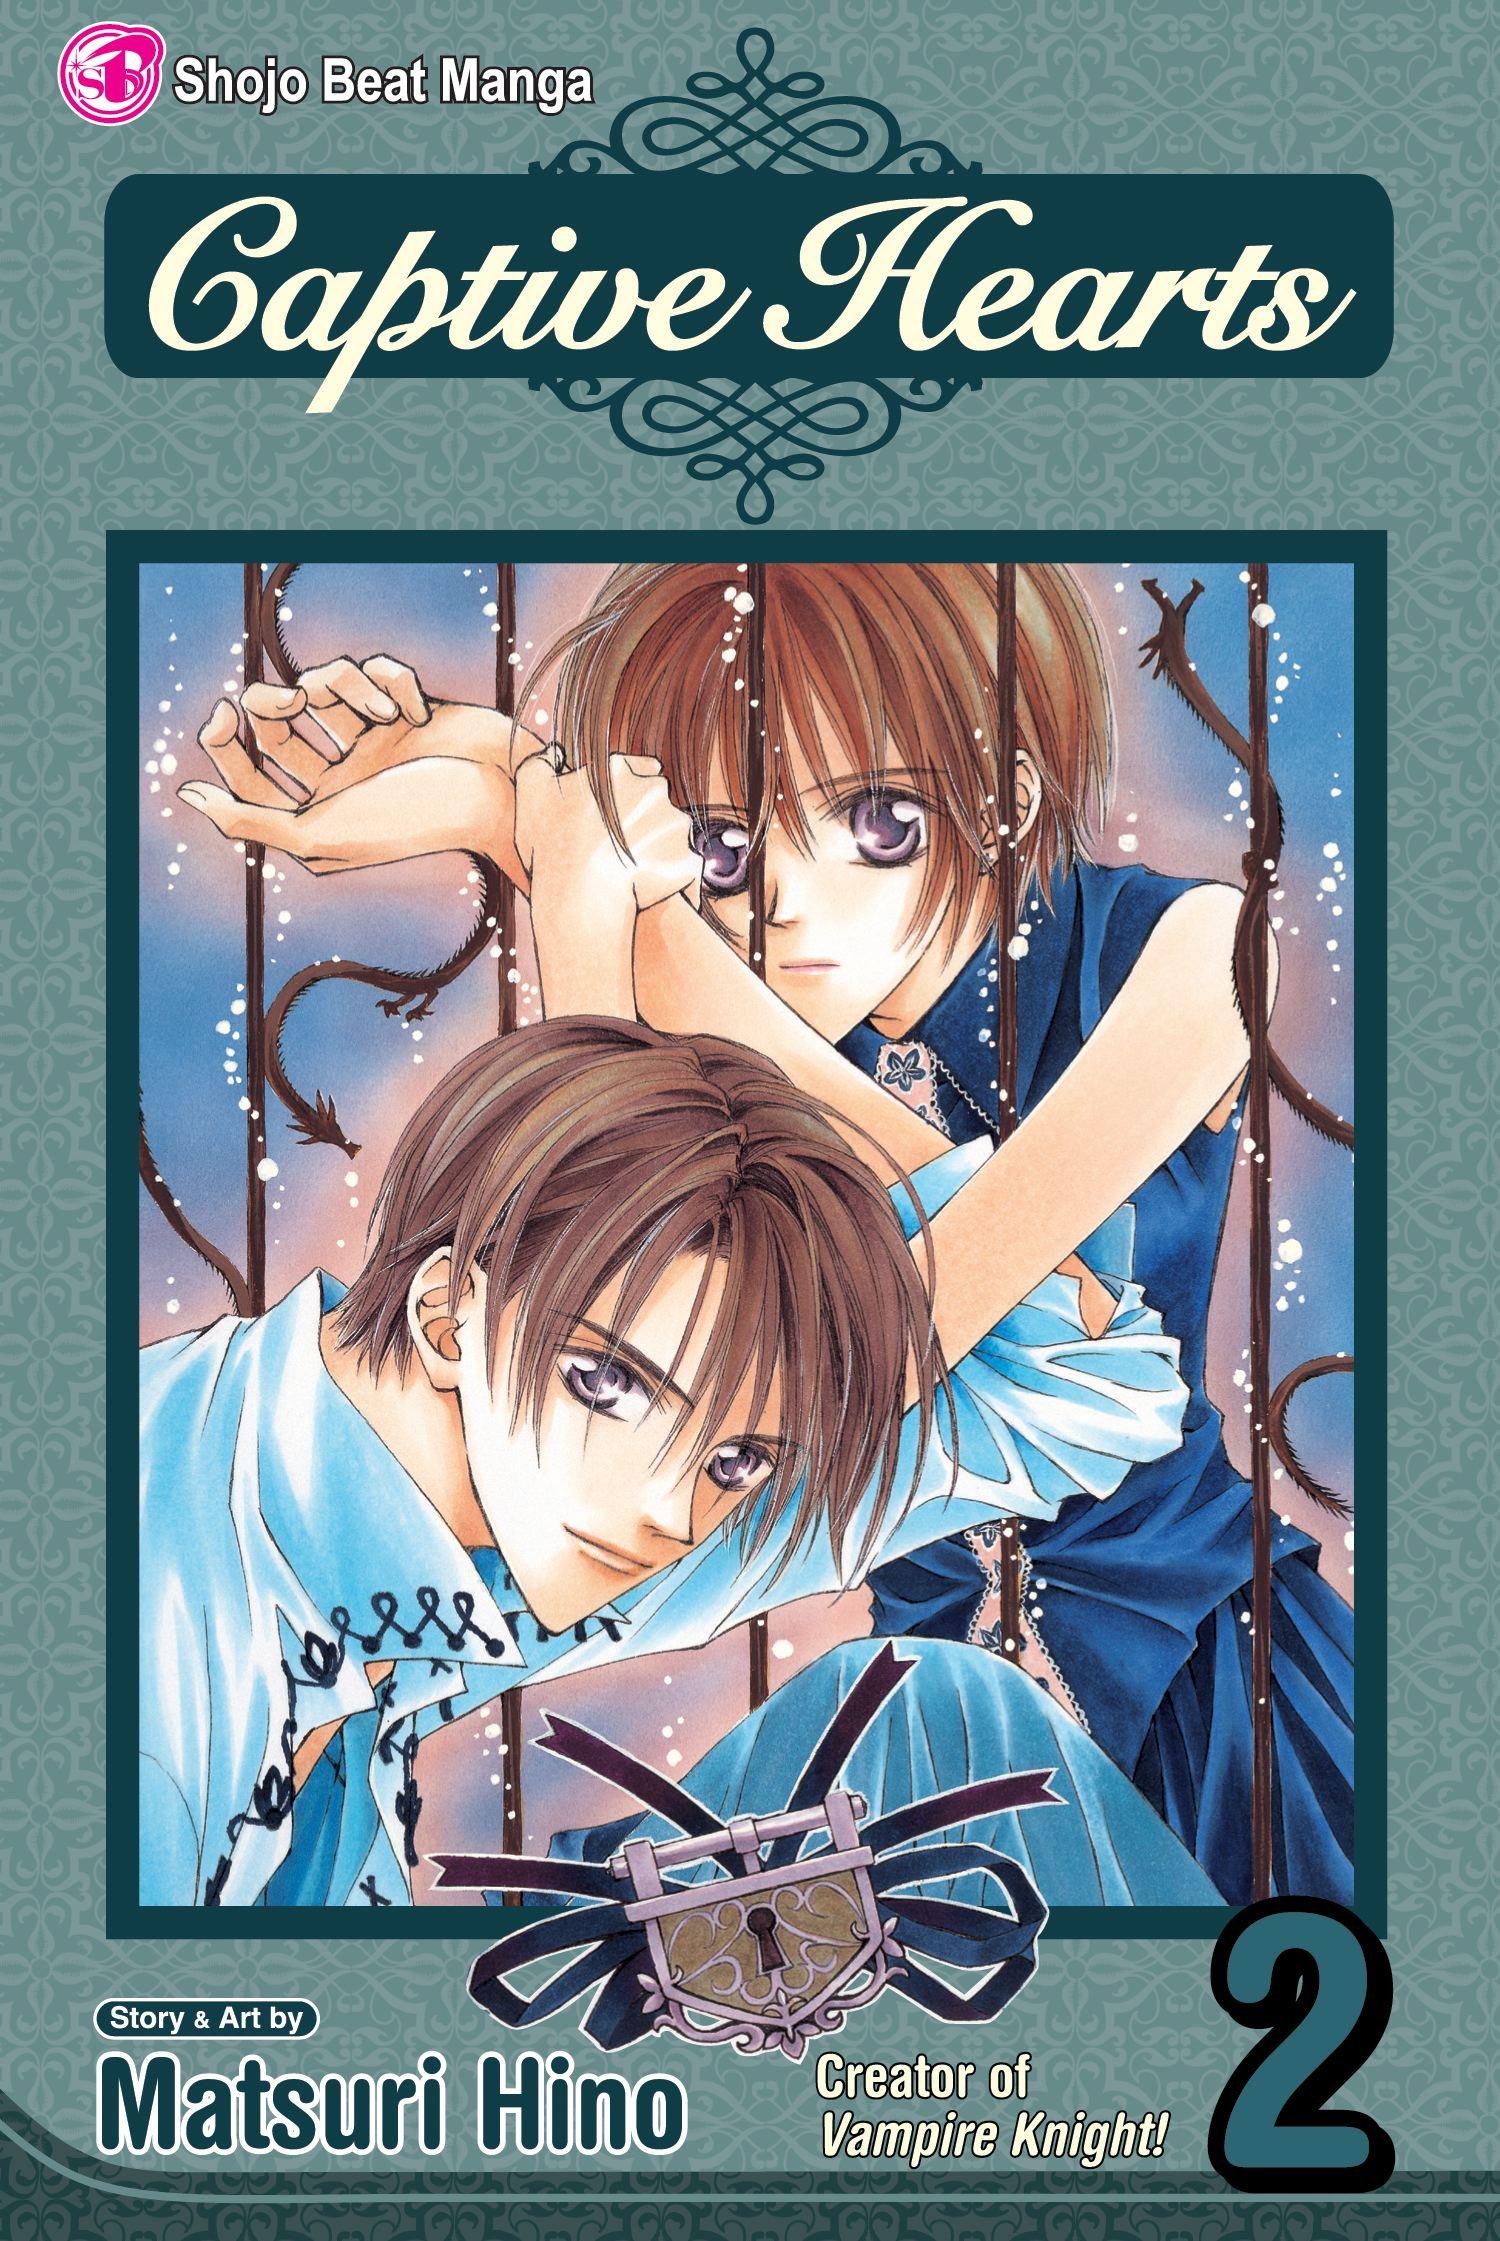 Book Cover Image (jpg): Captive Hearts, Vol. 2